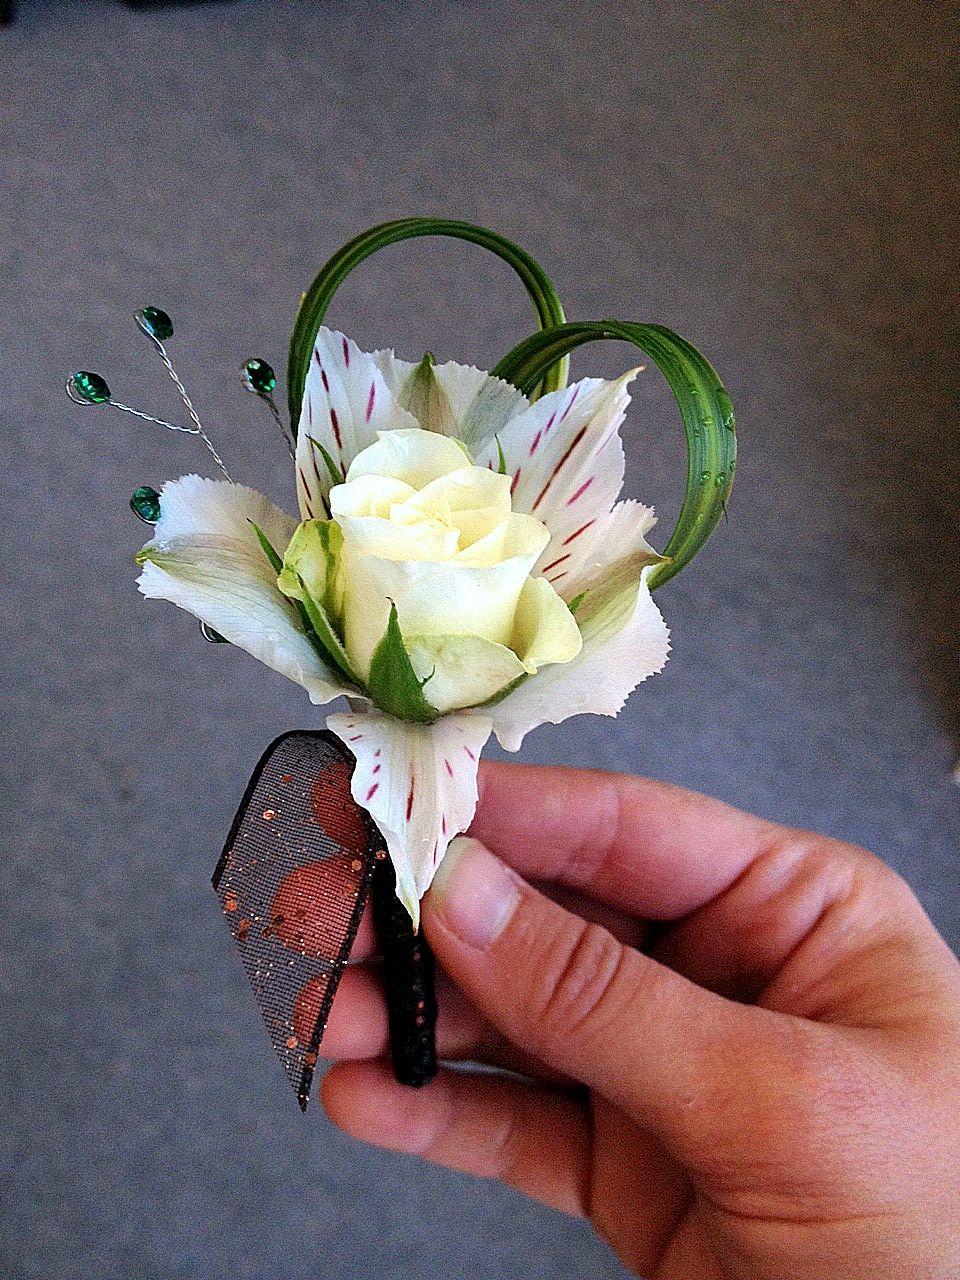 Modern White Spray Rose & Alstroemeria Boutonnière Rainbow ...White Spray Rose Boutonniere